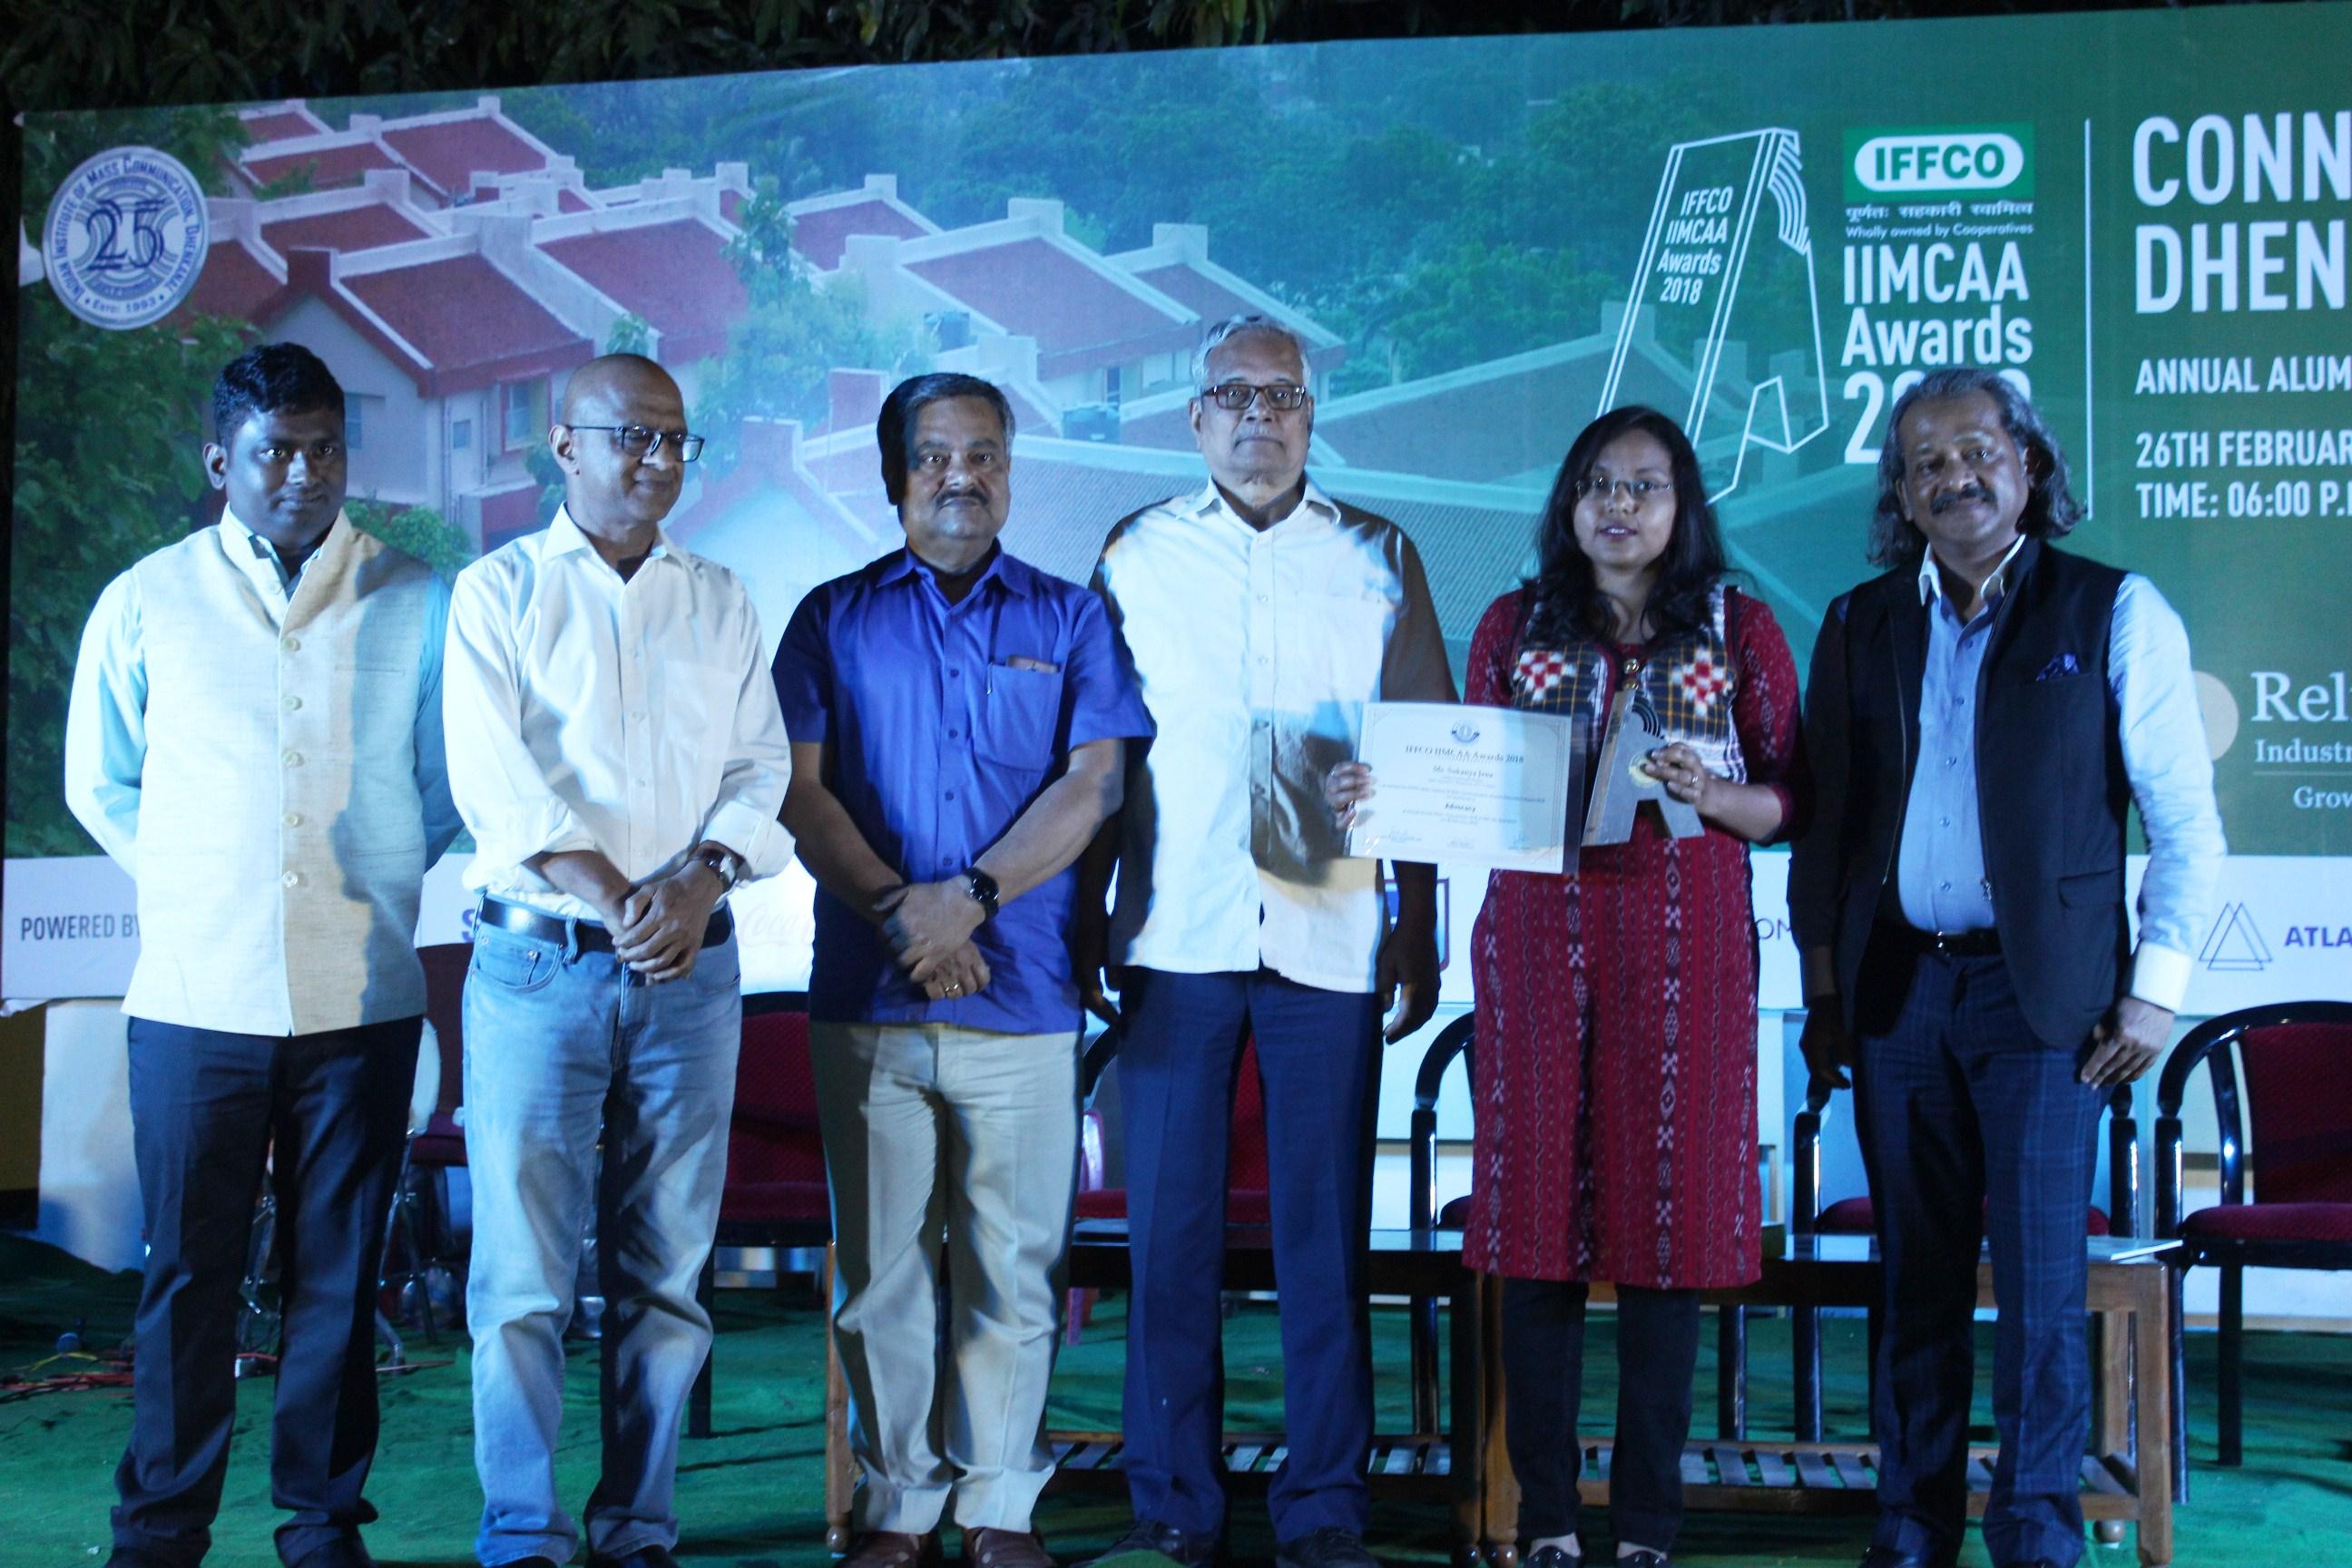 IFFCO IIMCAA Awards to Ms. Sukanya Jena